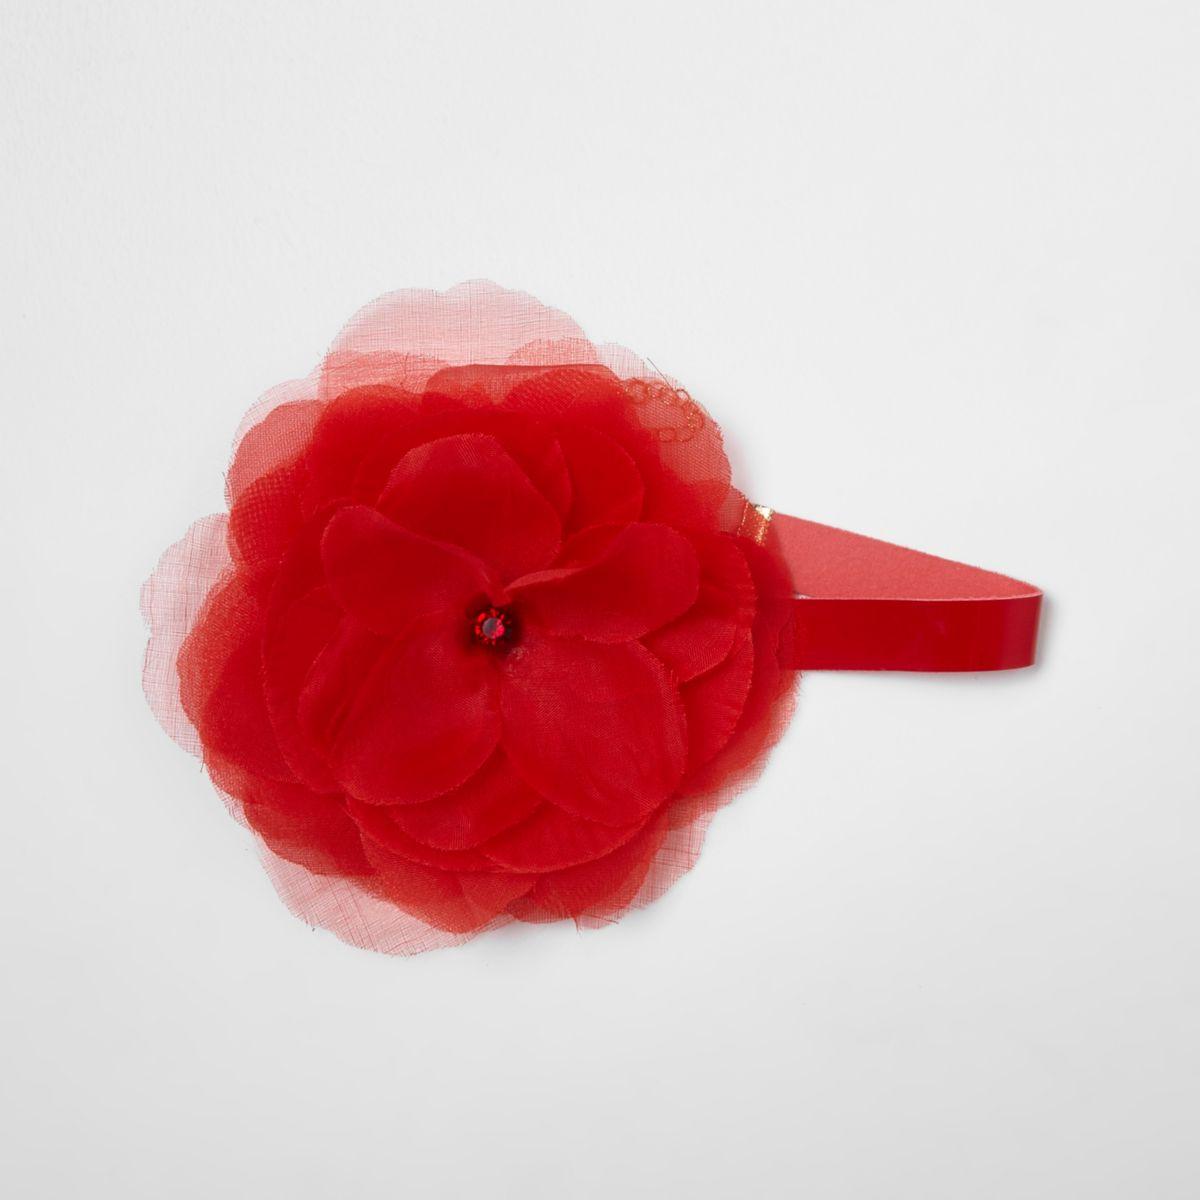 Red oversized flower corsage choker